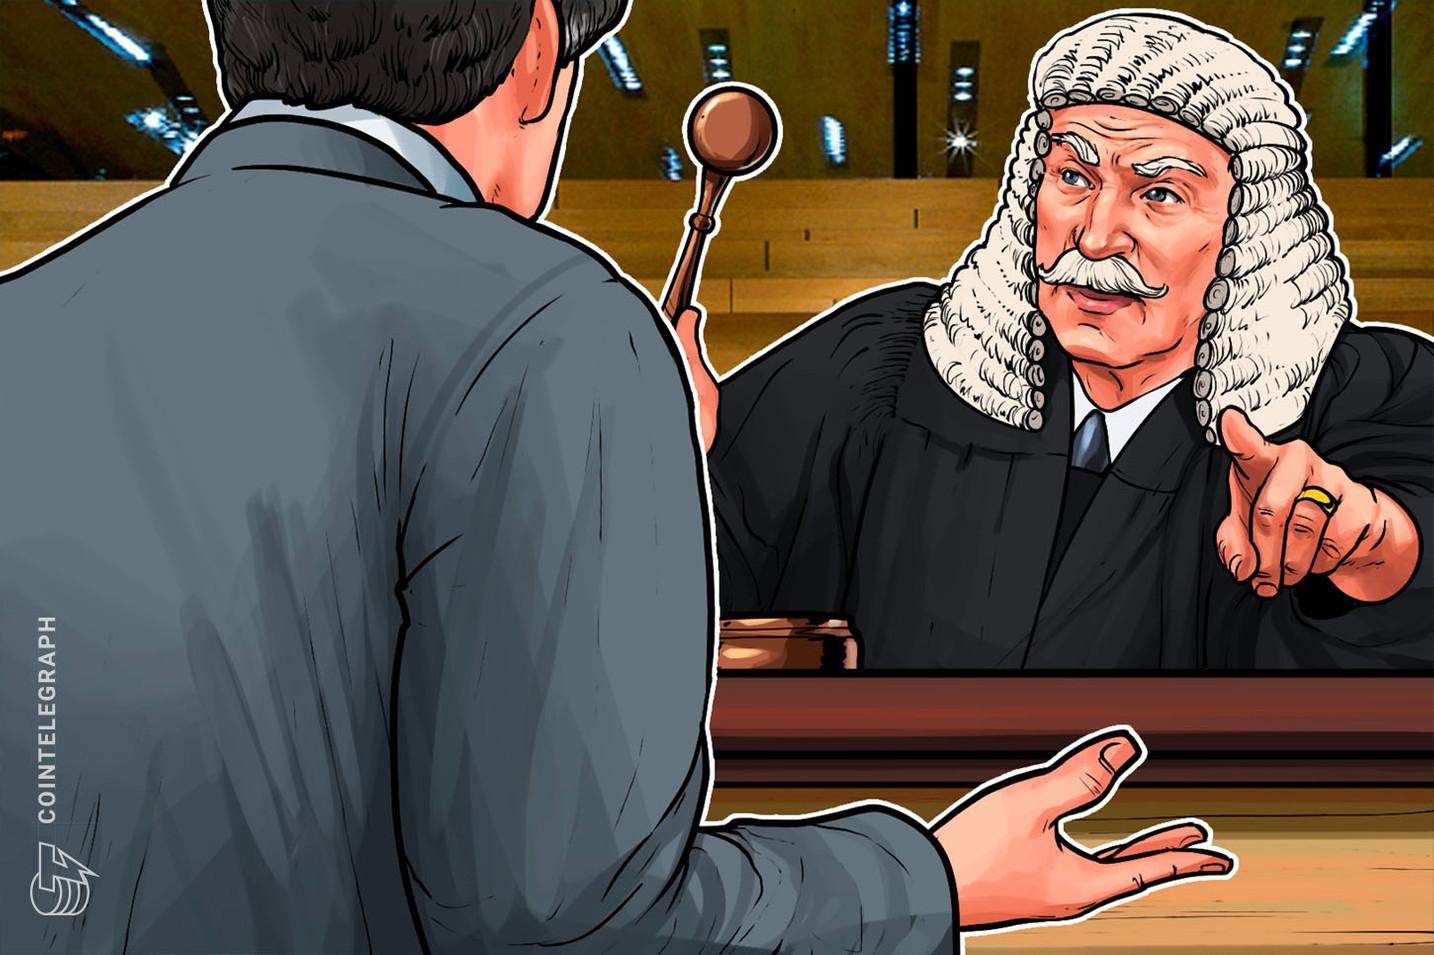 Jeff Garzik erhält Vorladung wegen 4 Mrd. US-Dollar Prozess gegen Craig Wright